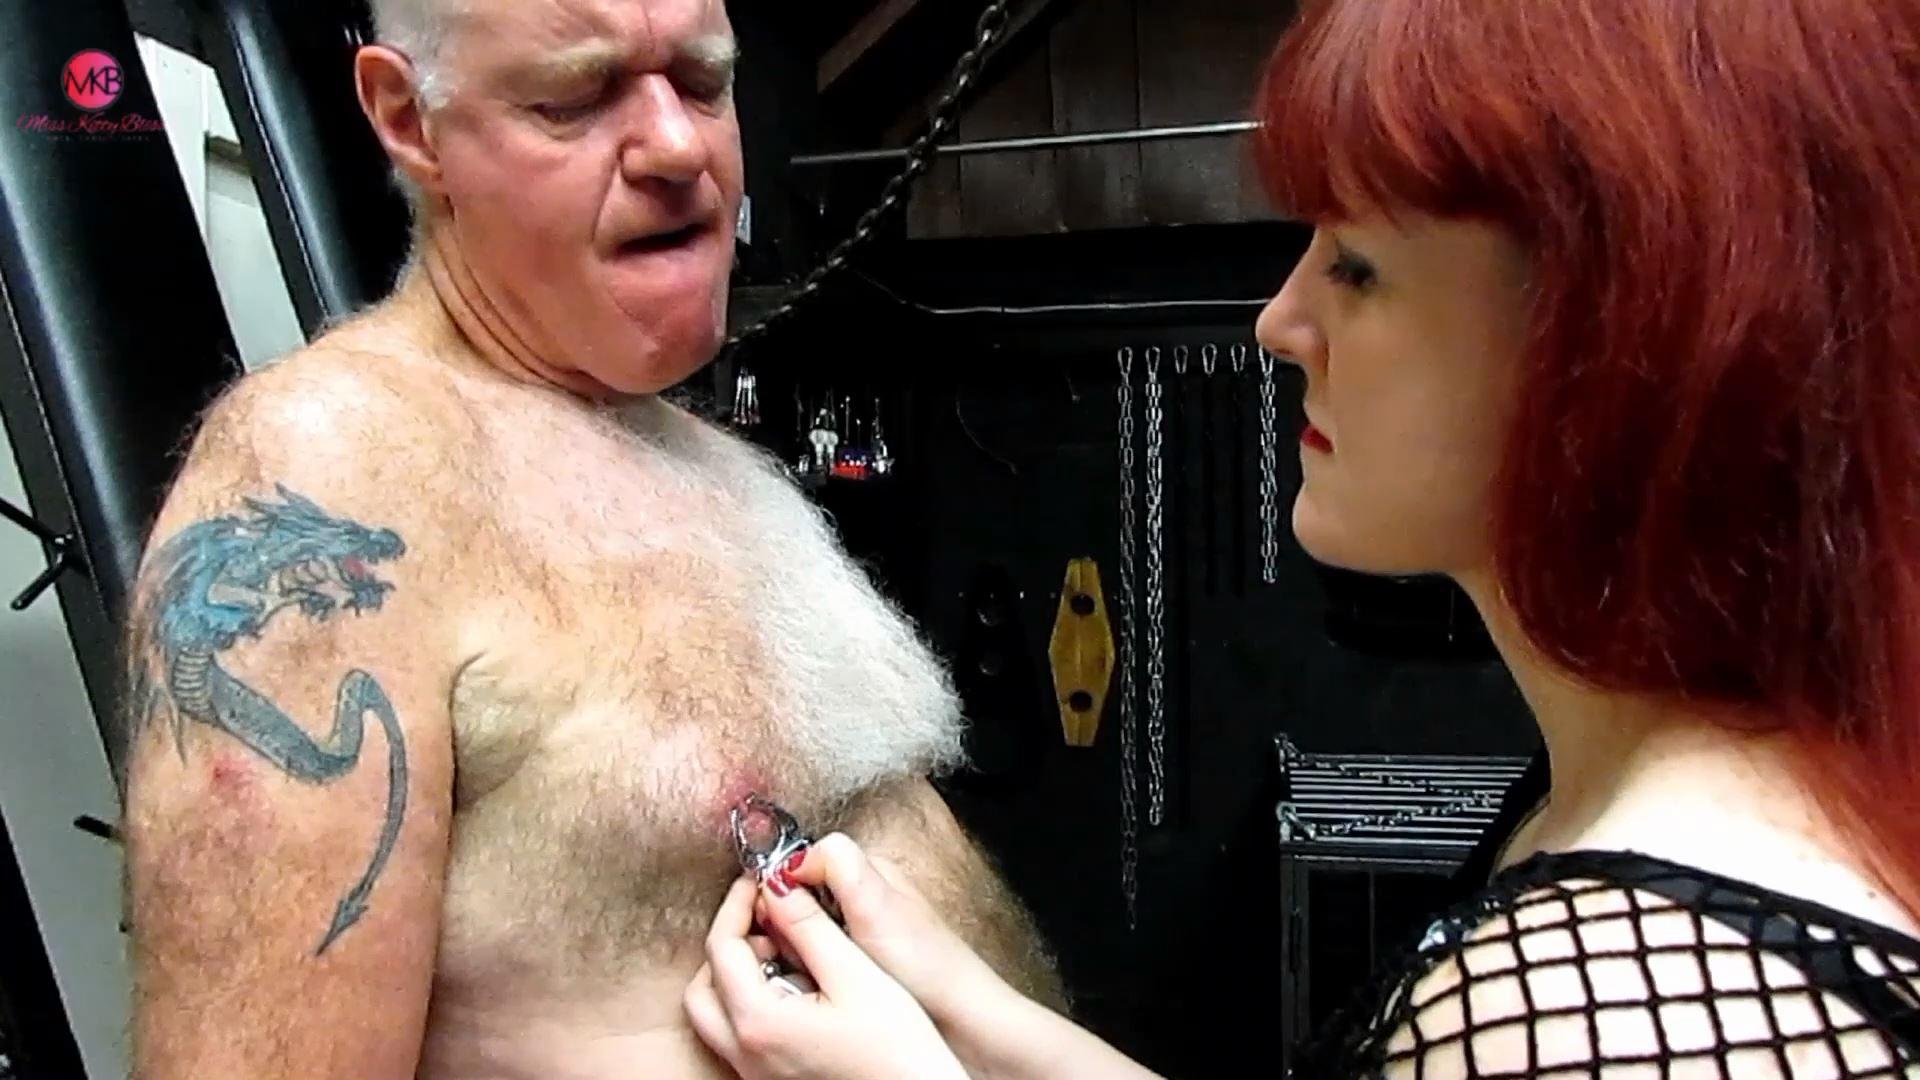 Clamped Nipples & Balls - MISS KITTY BLISS - FULL HD/1080p/MP4